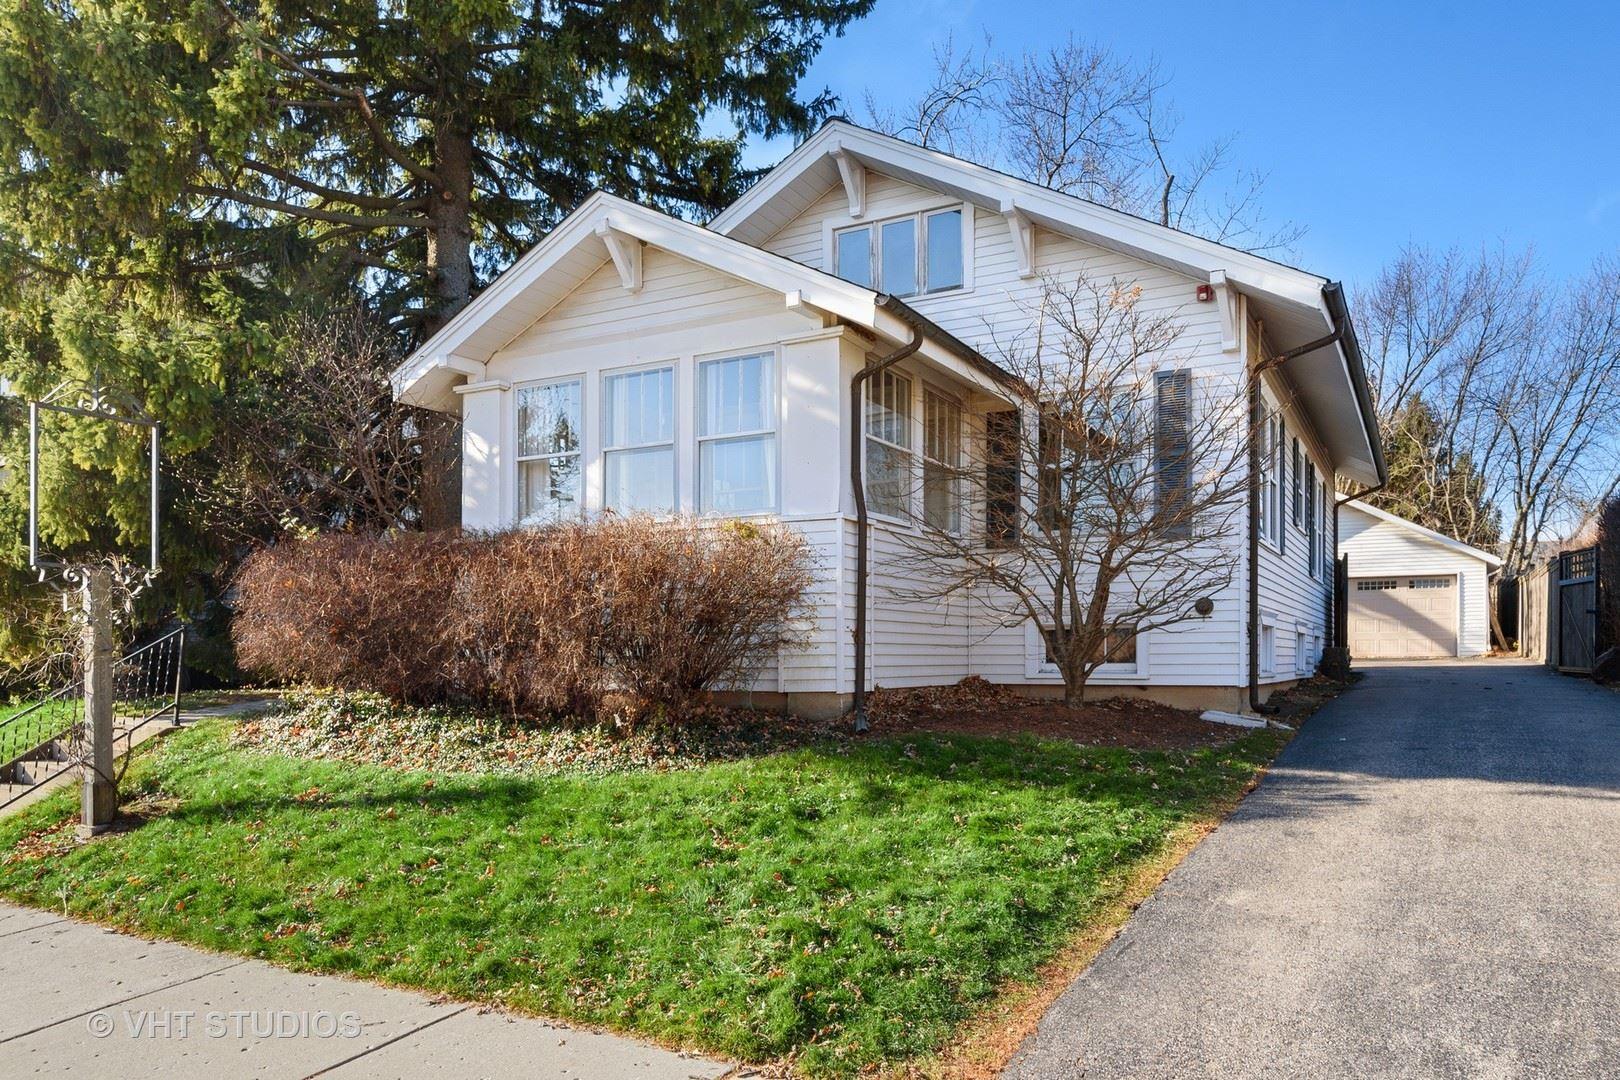 Photo for 114 Applebee Street, Barrington, IL 60010 (MLS # 10961148)